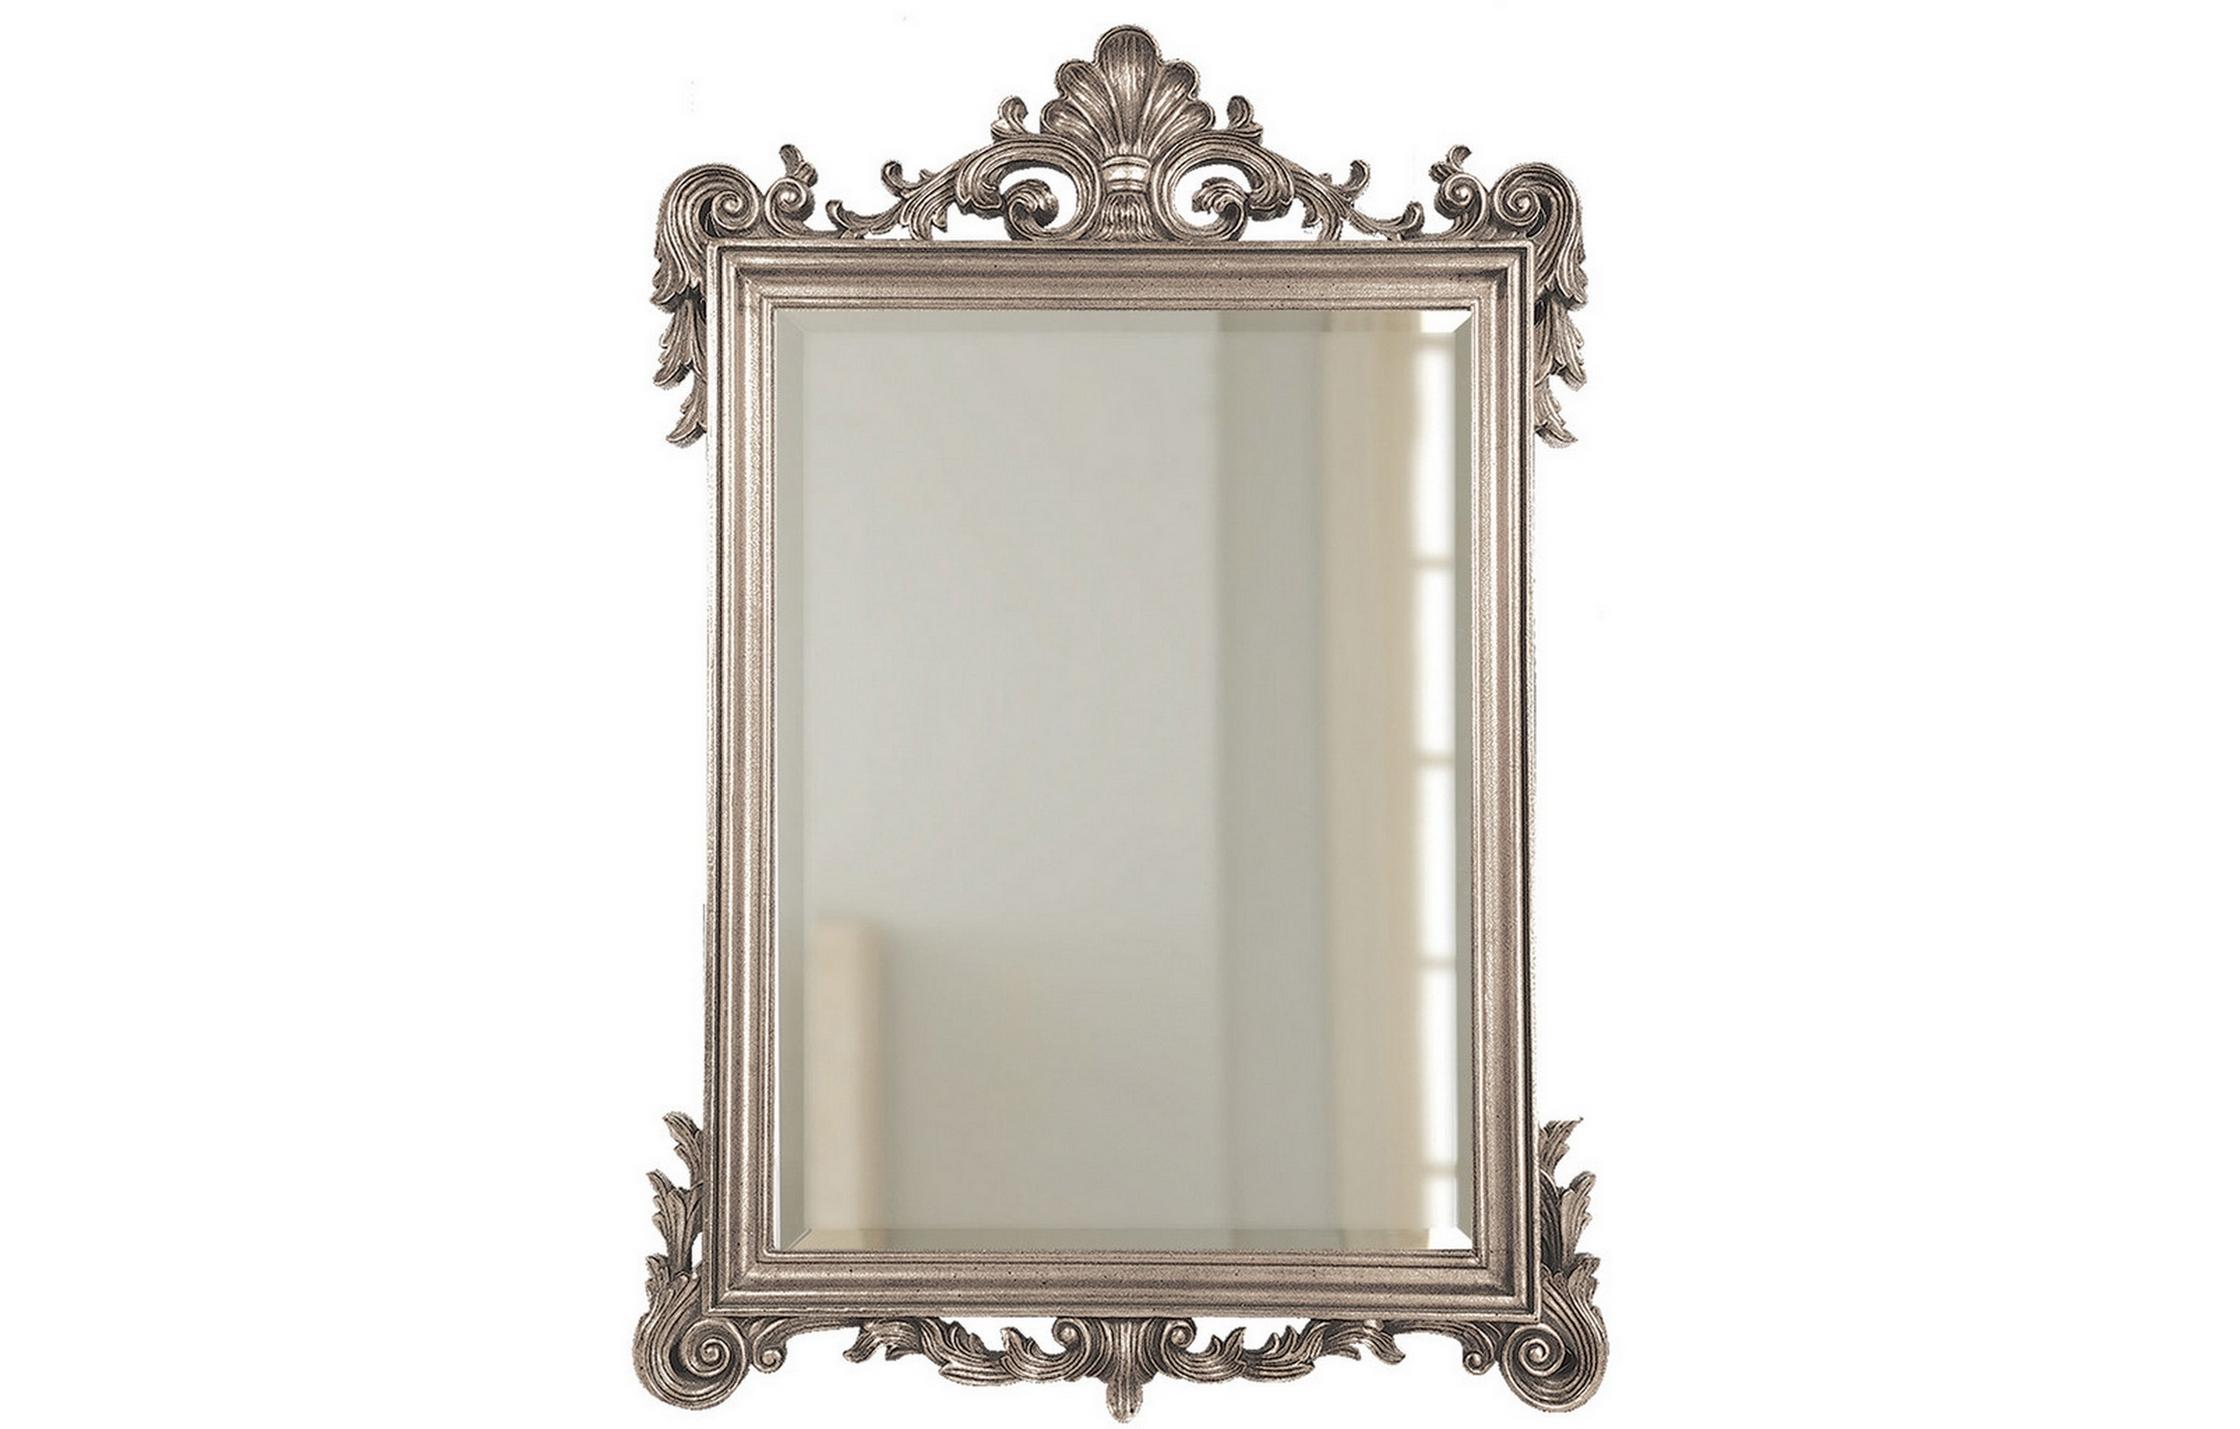 Зеркало МарсельНастенные зеркала<br>Материал: дерево, полиуретан.<br><br>Material: Пластик<br>Width см: 81<br>Depth см: 6<br>Height см: 117